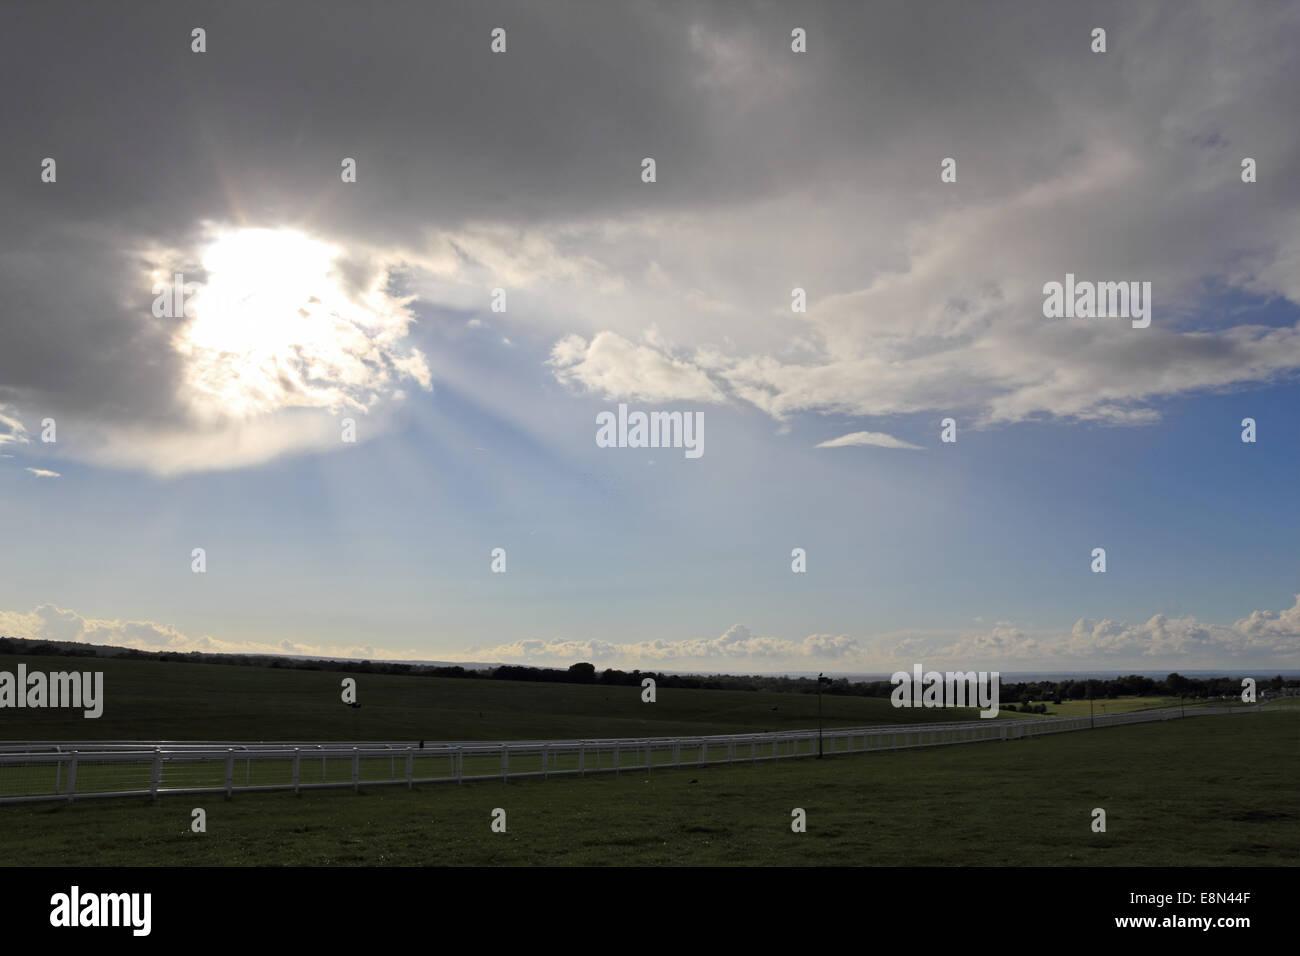 Epsom Downs, Surrey, UK. 11th October 2014. Blue skies alternate with dramatic cumulonimbus rain clouds over Epsom - Stock Image